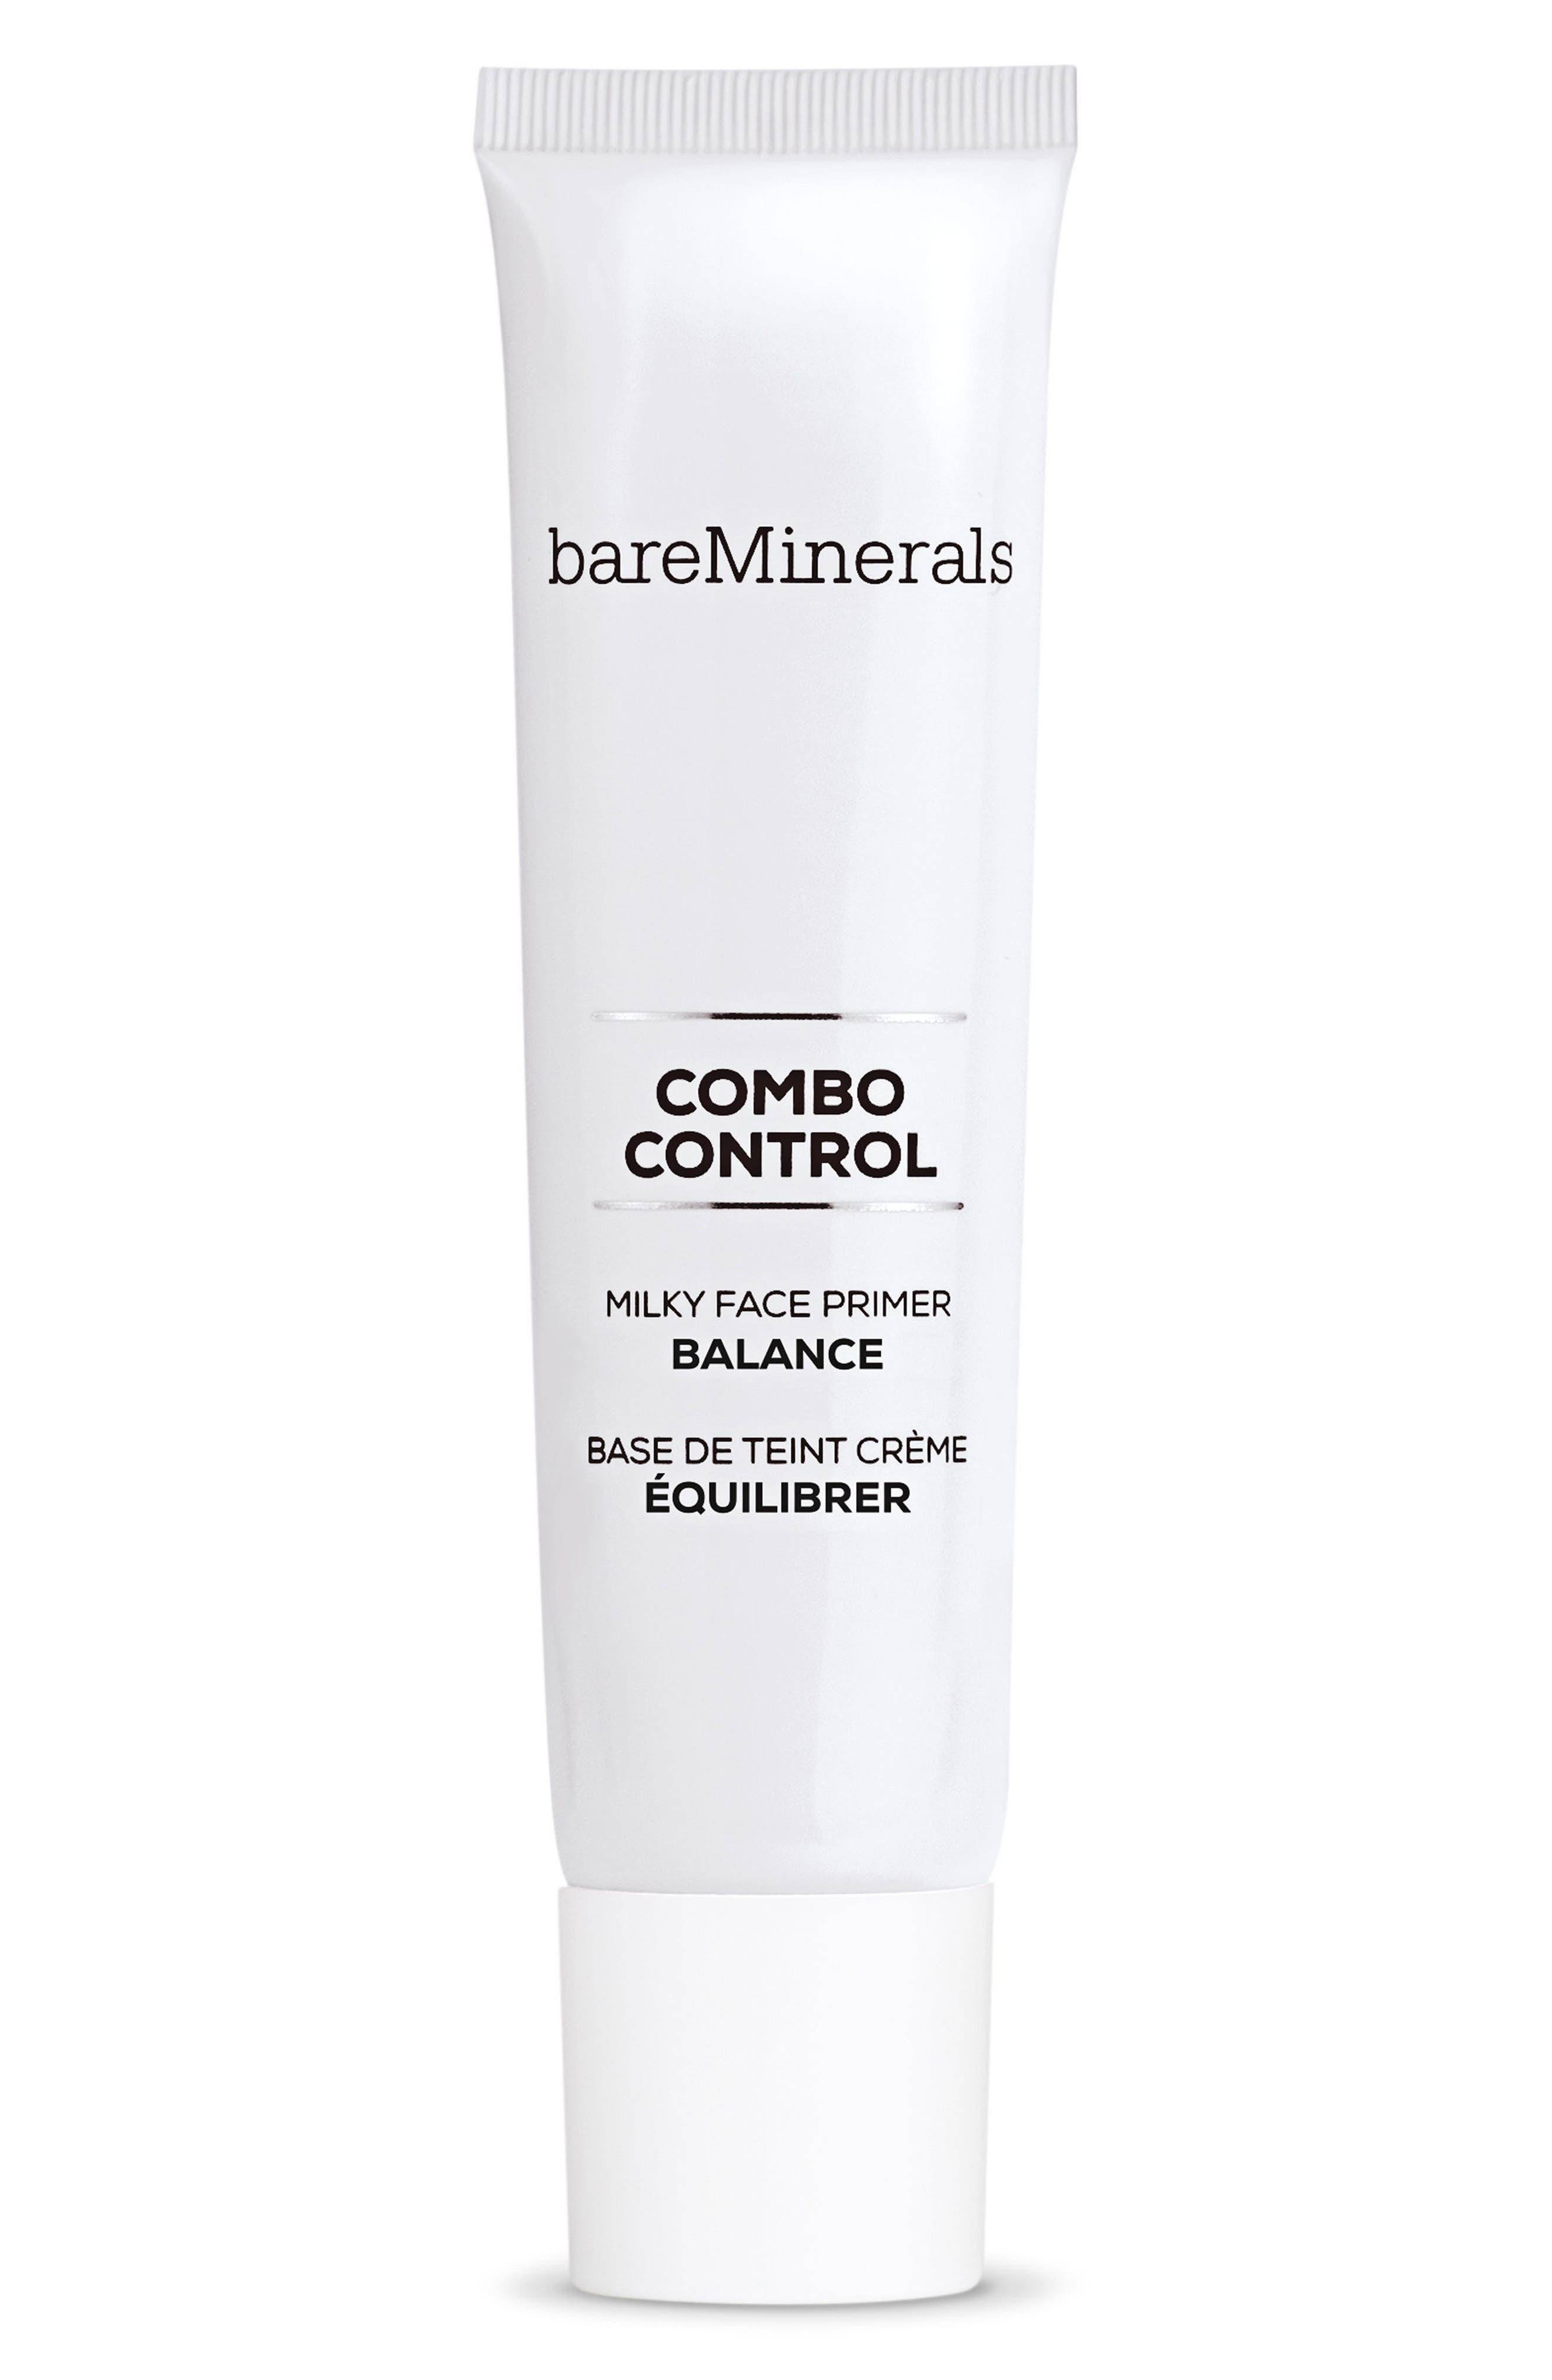 bareMinerals® Combo Control Milky Face Primer